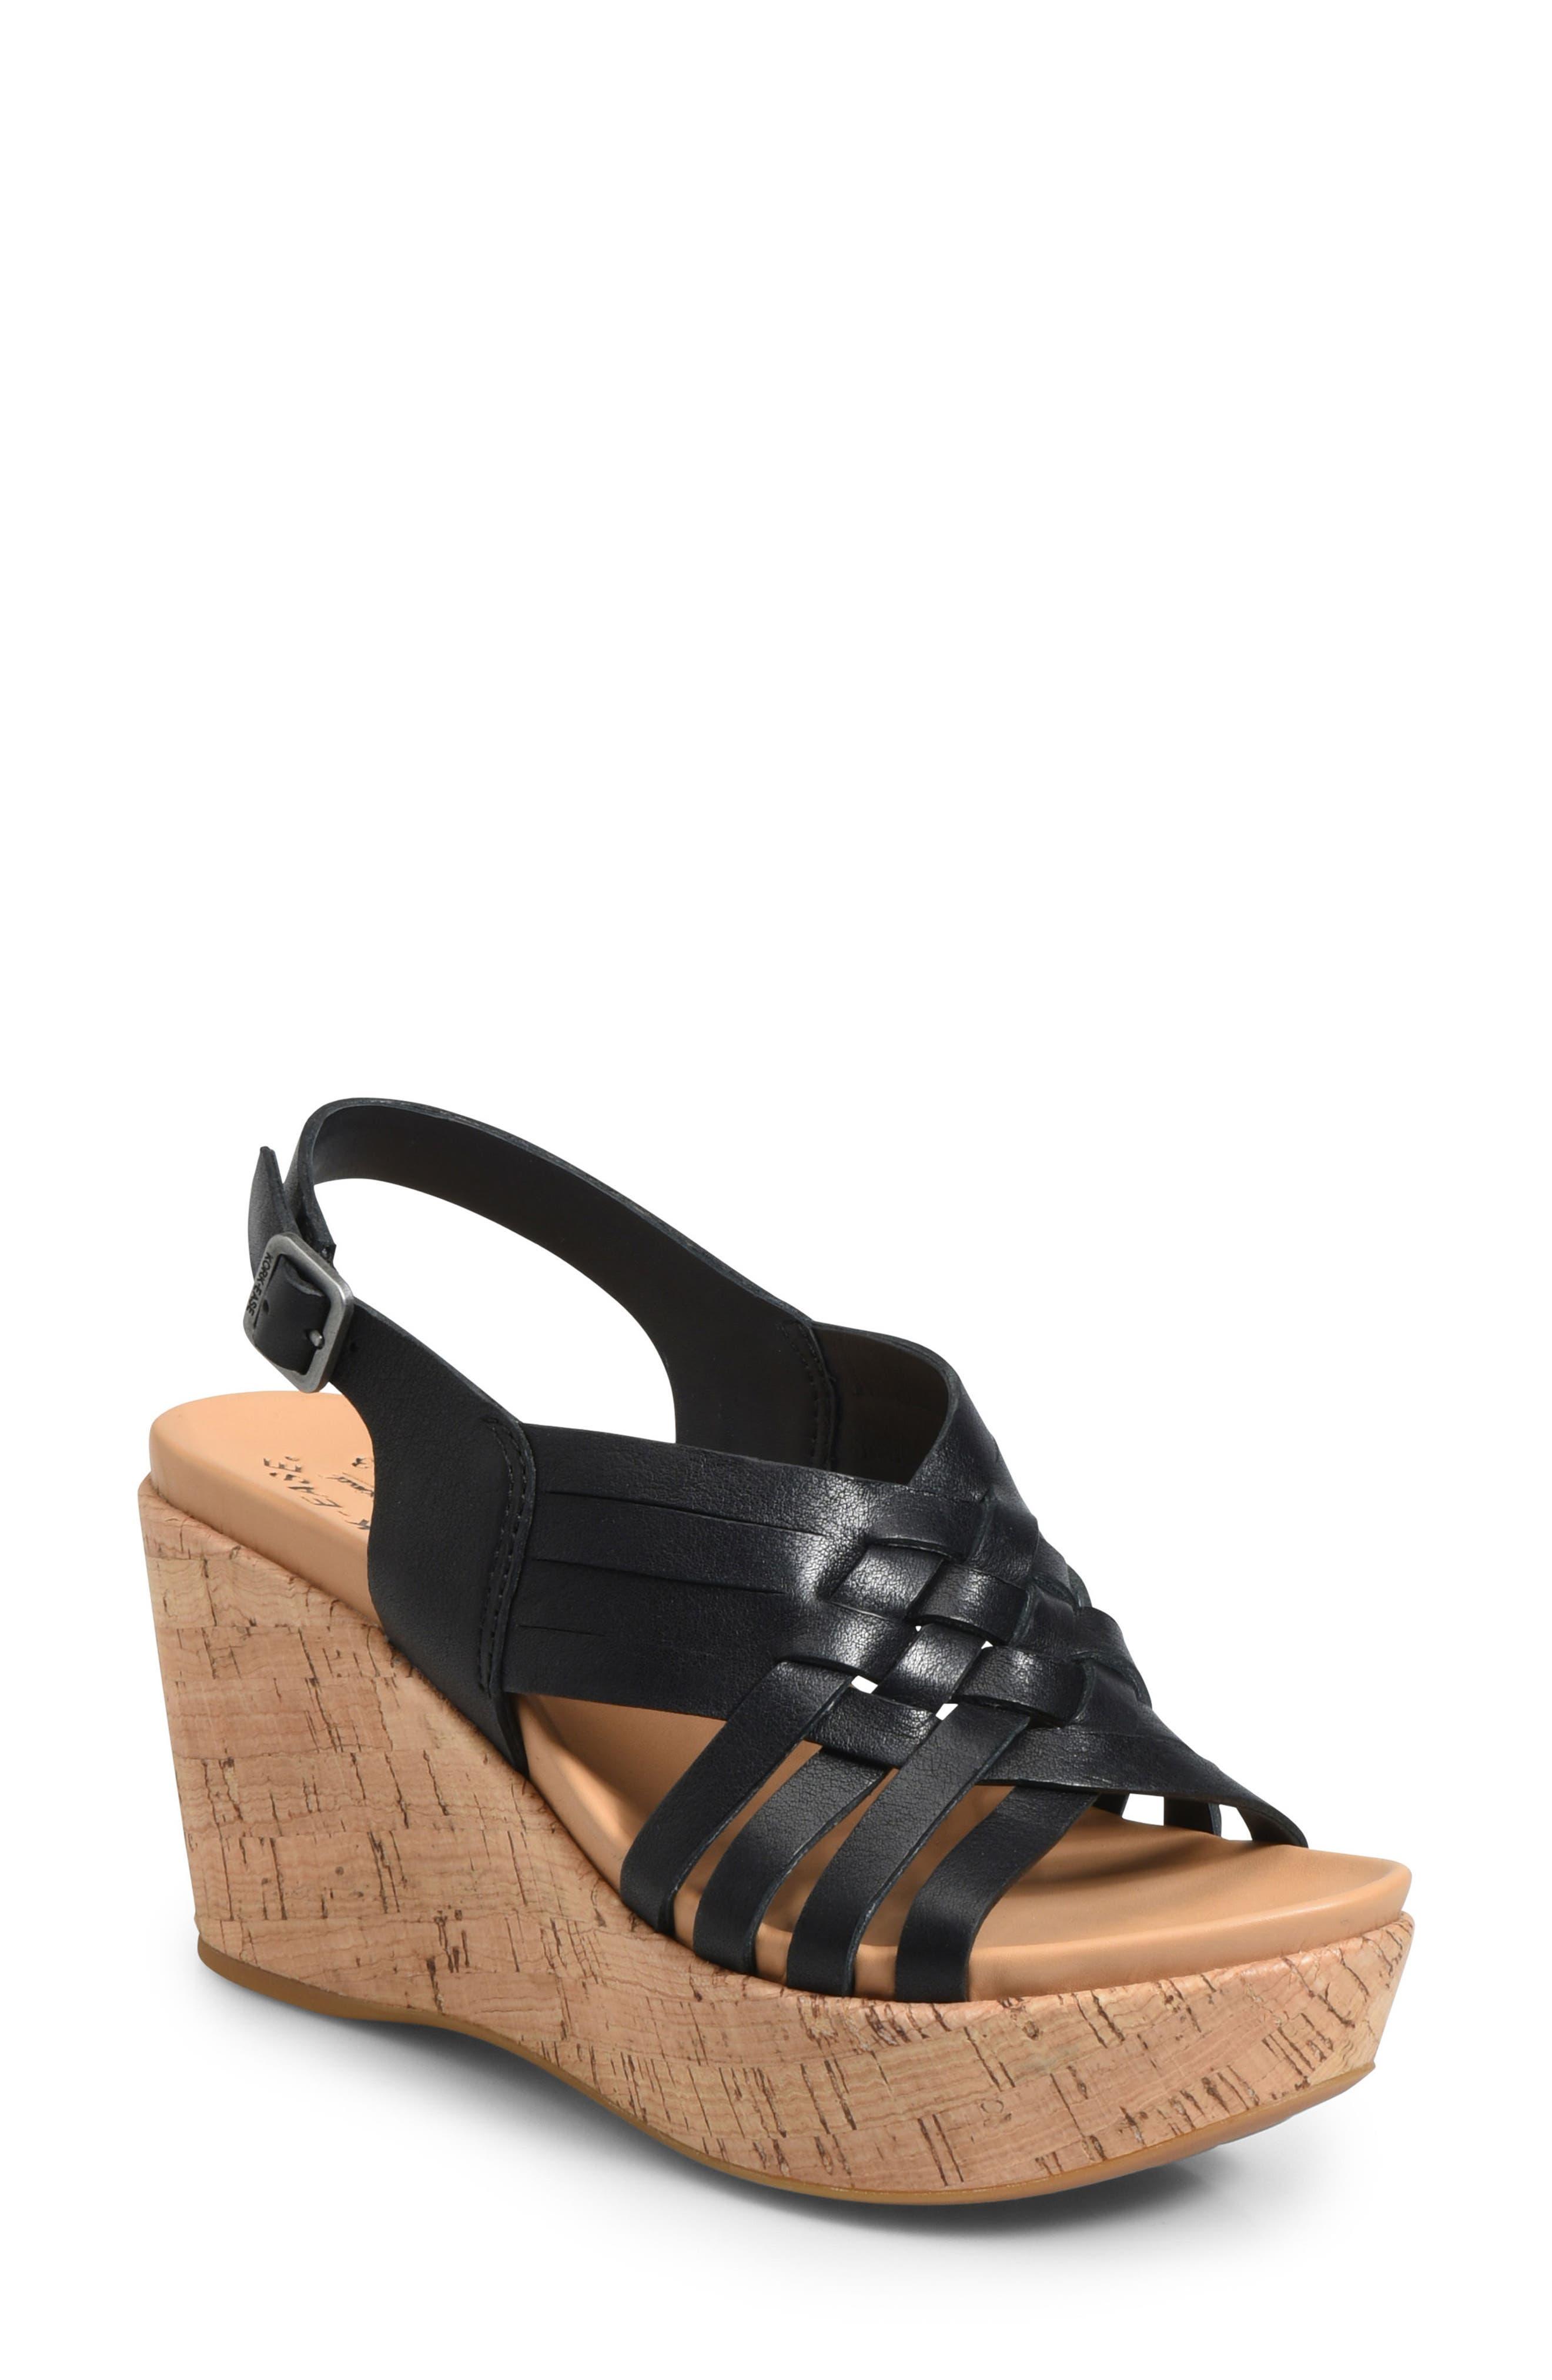 Adelanto Wedge Sandal,                         Main,                         color, BLACK LEATHER